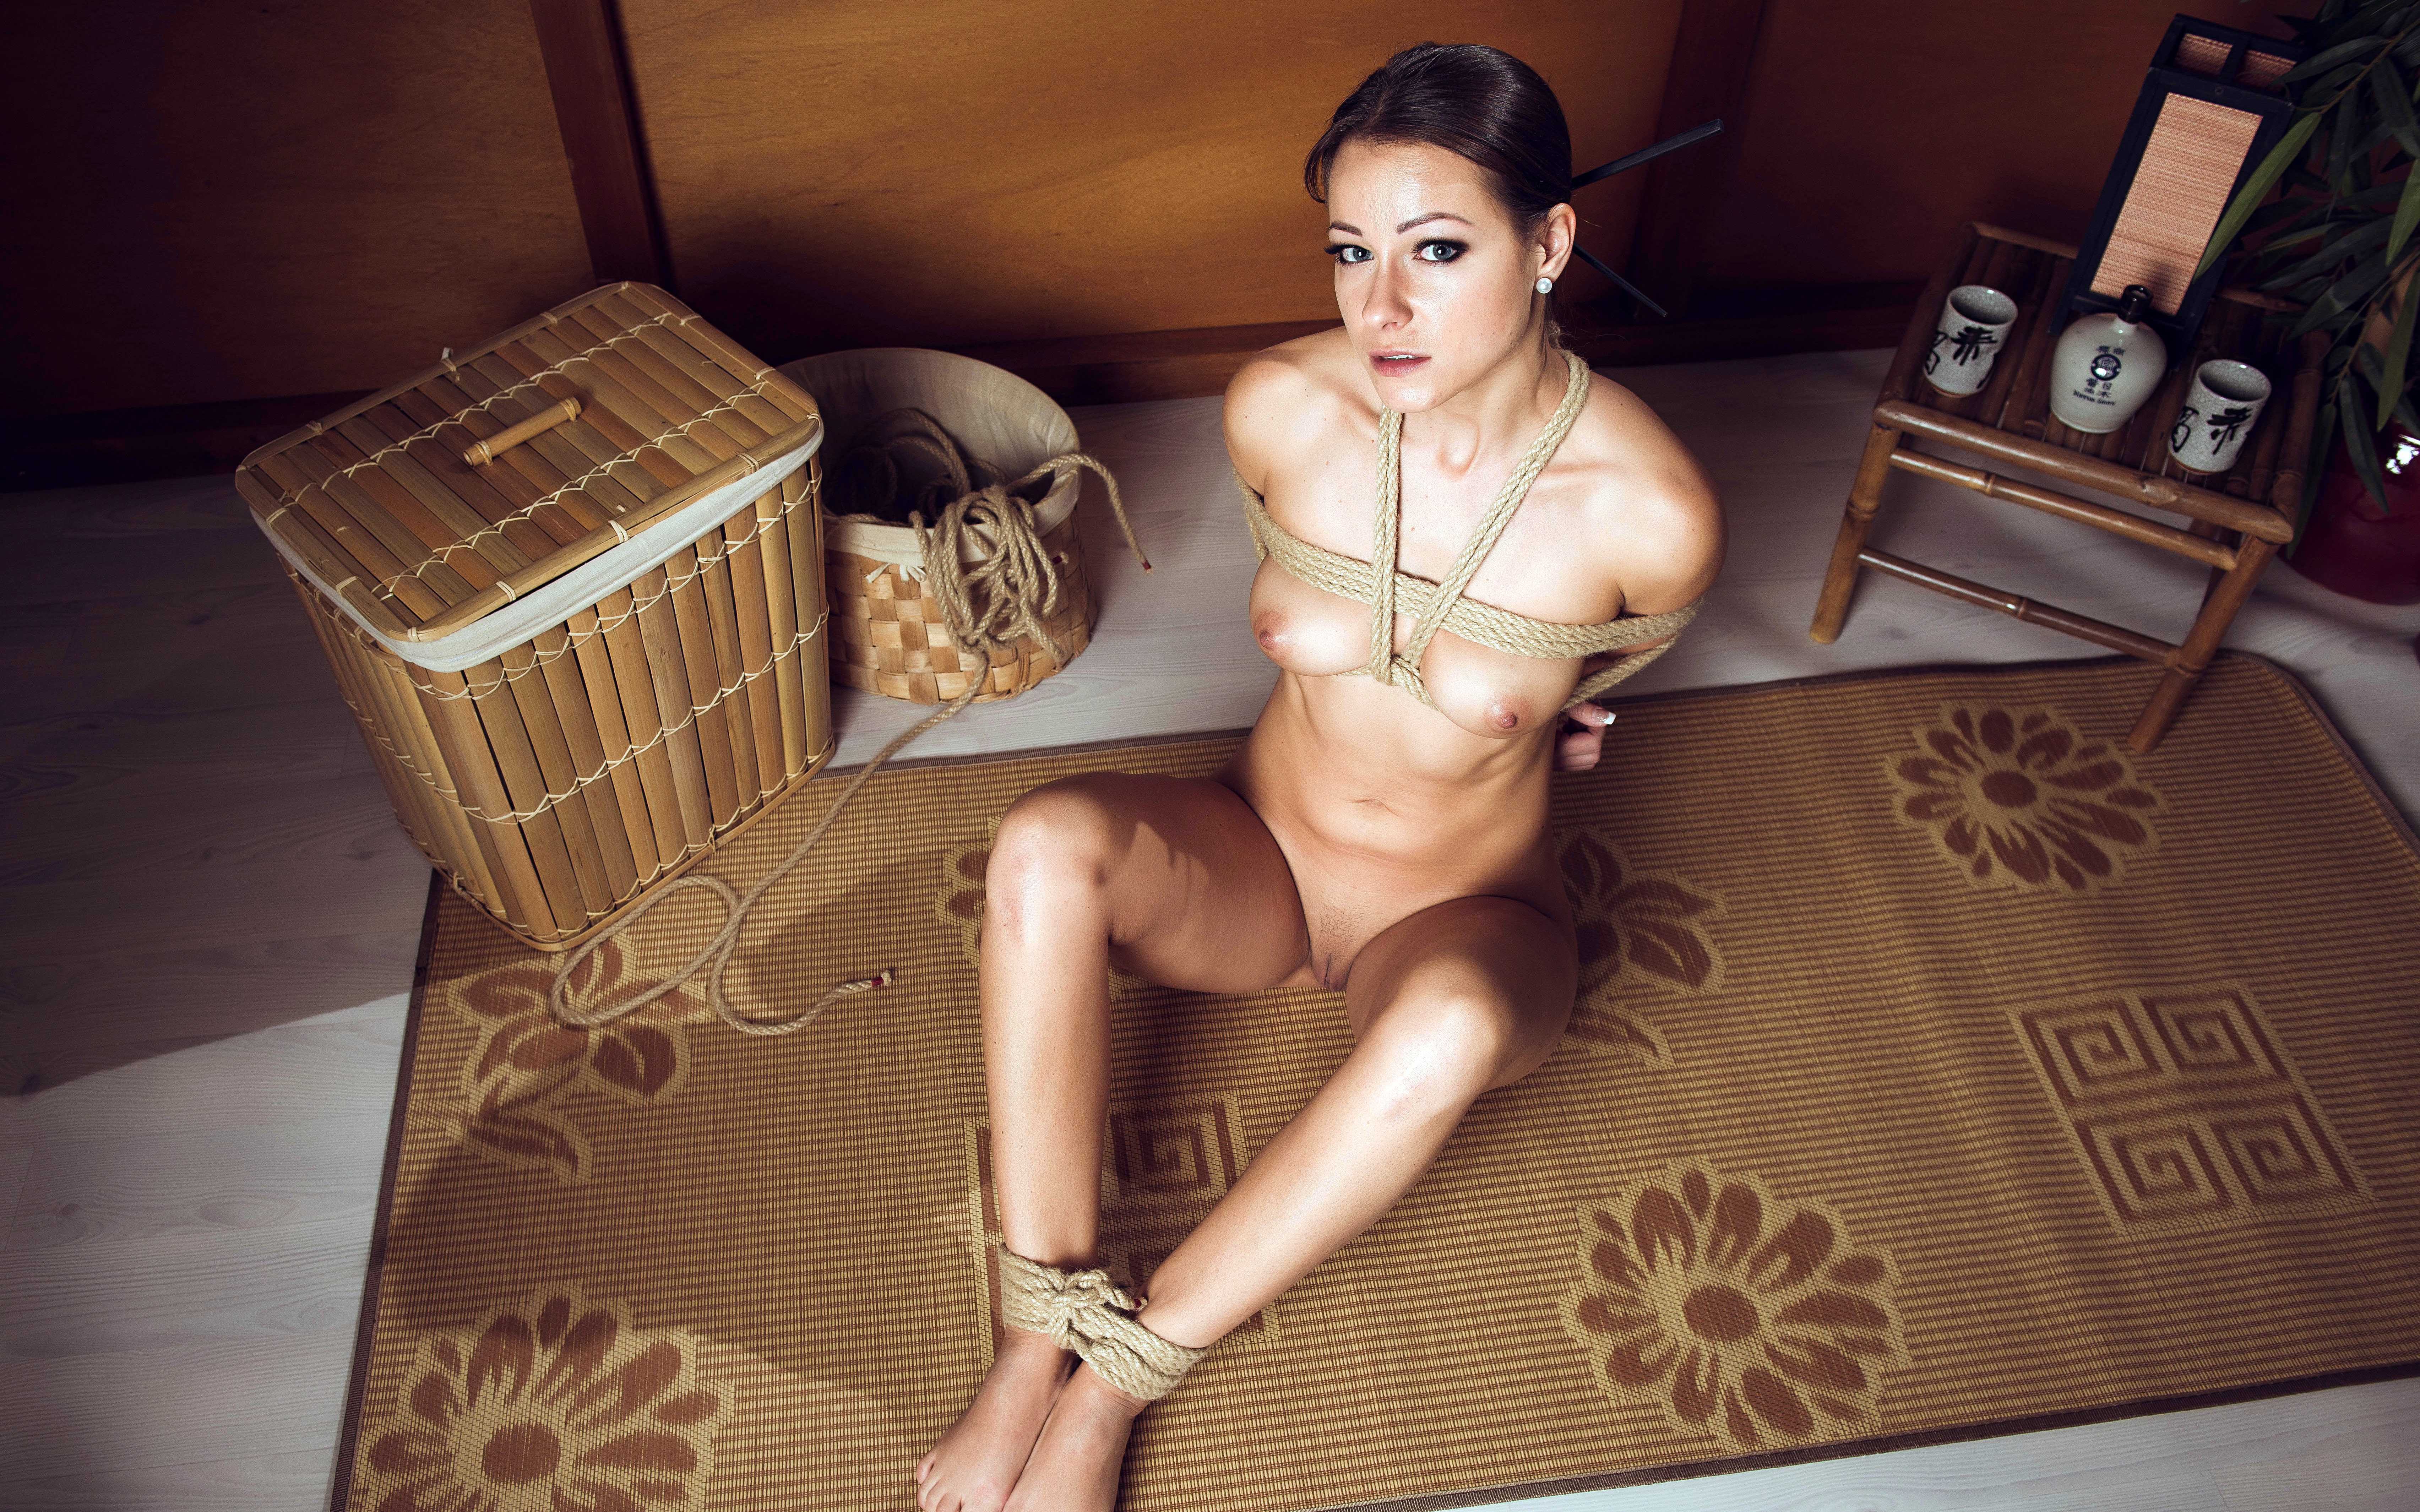 Brunette tied up rope bed